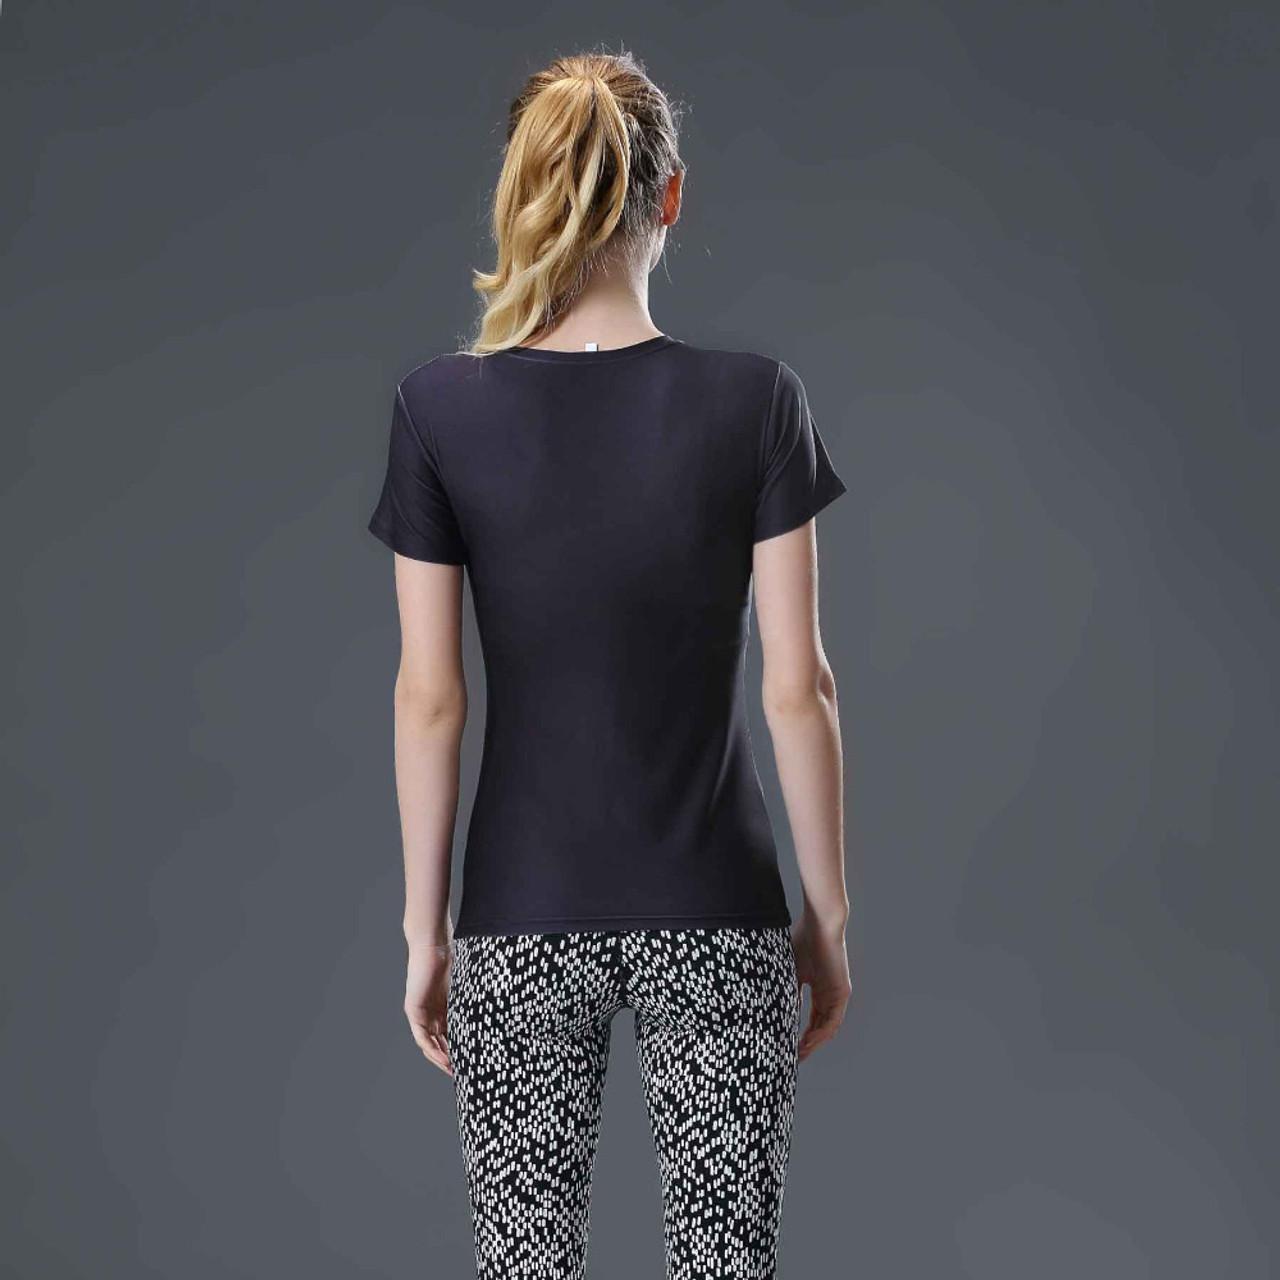 5a4e0378910 ... T Shirt Captain America Shield Civil War Tee 3D Printed T-shirts girl s  Marvel Avengers ...